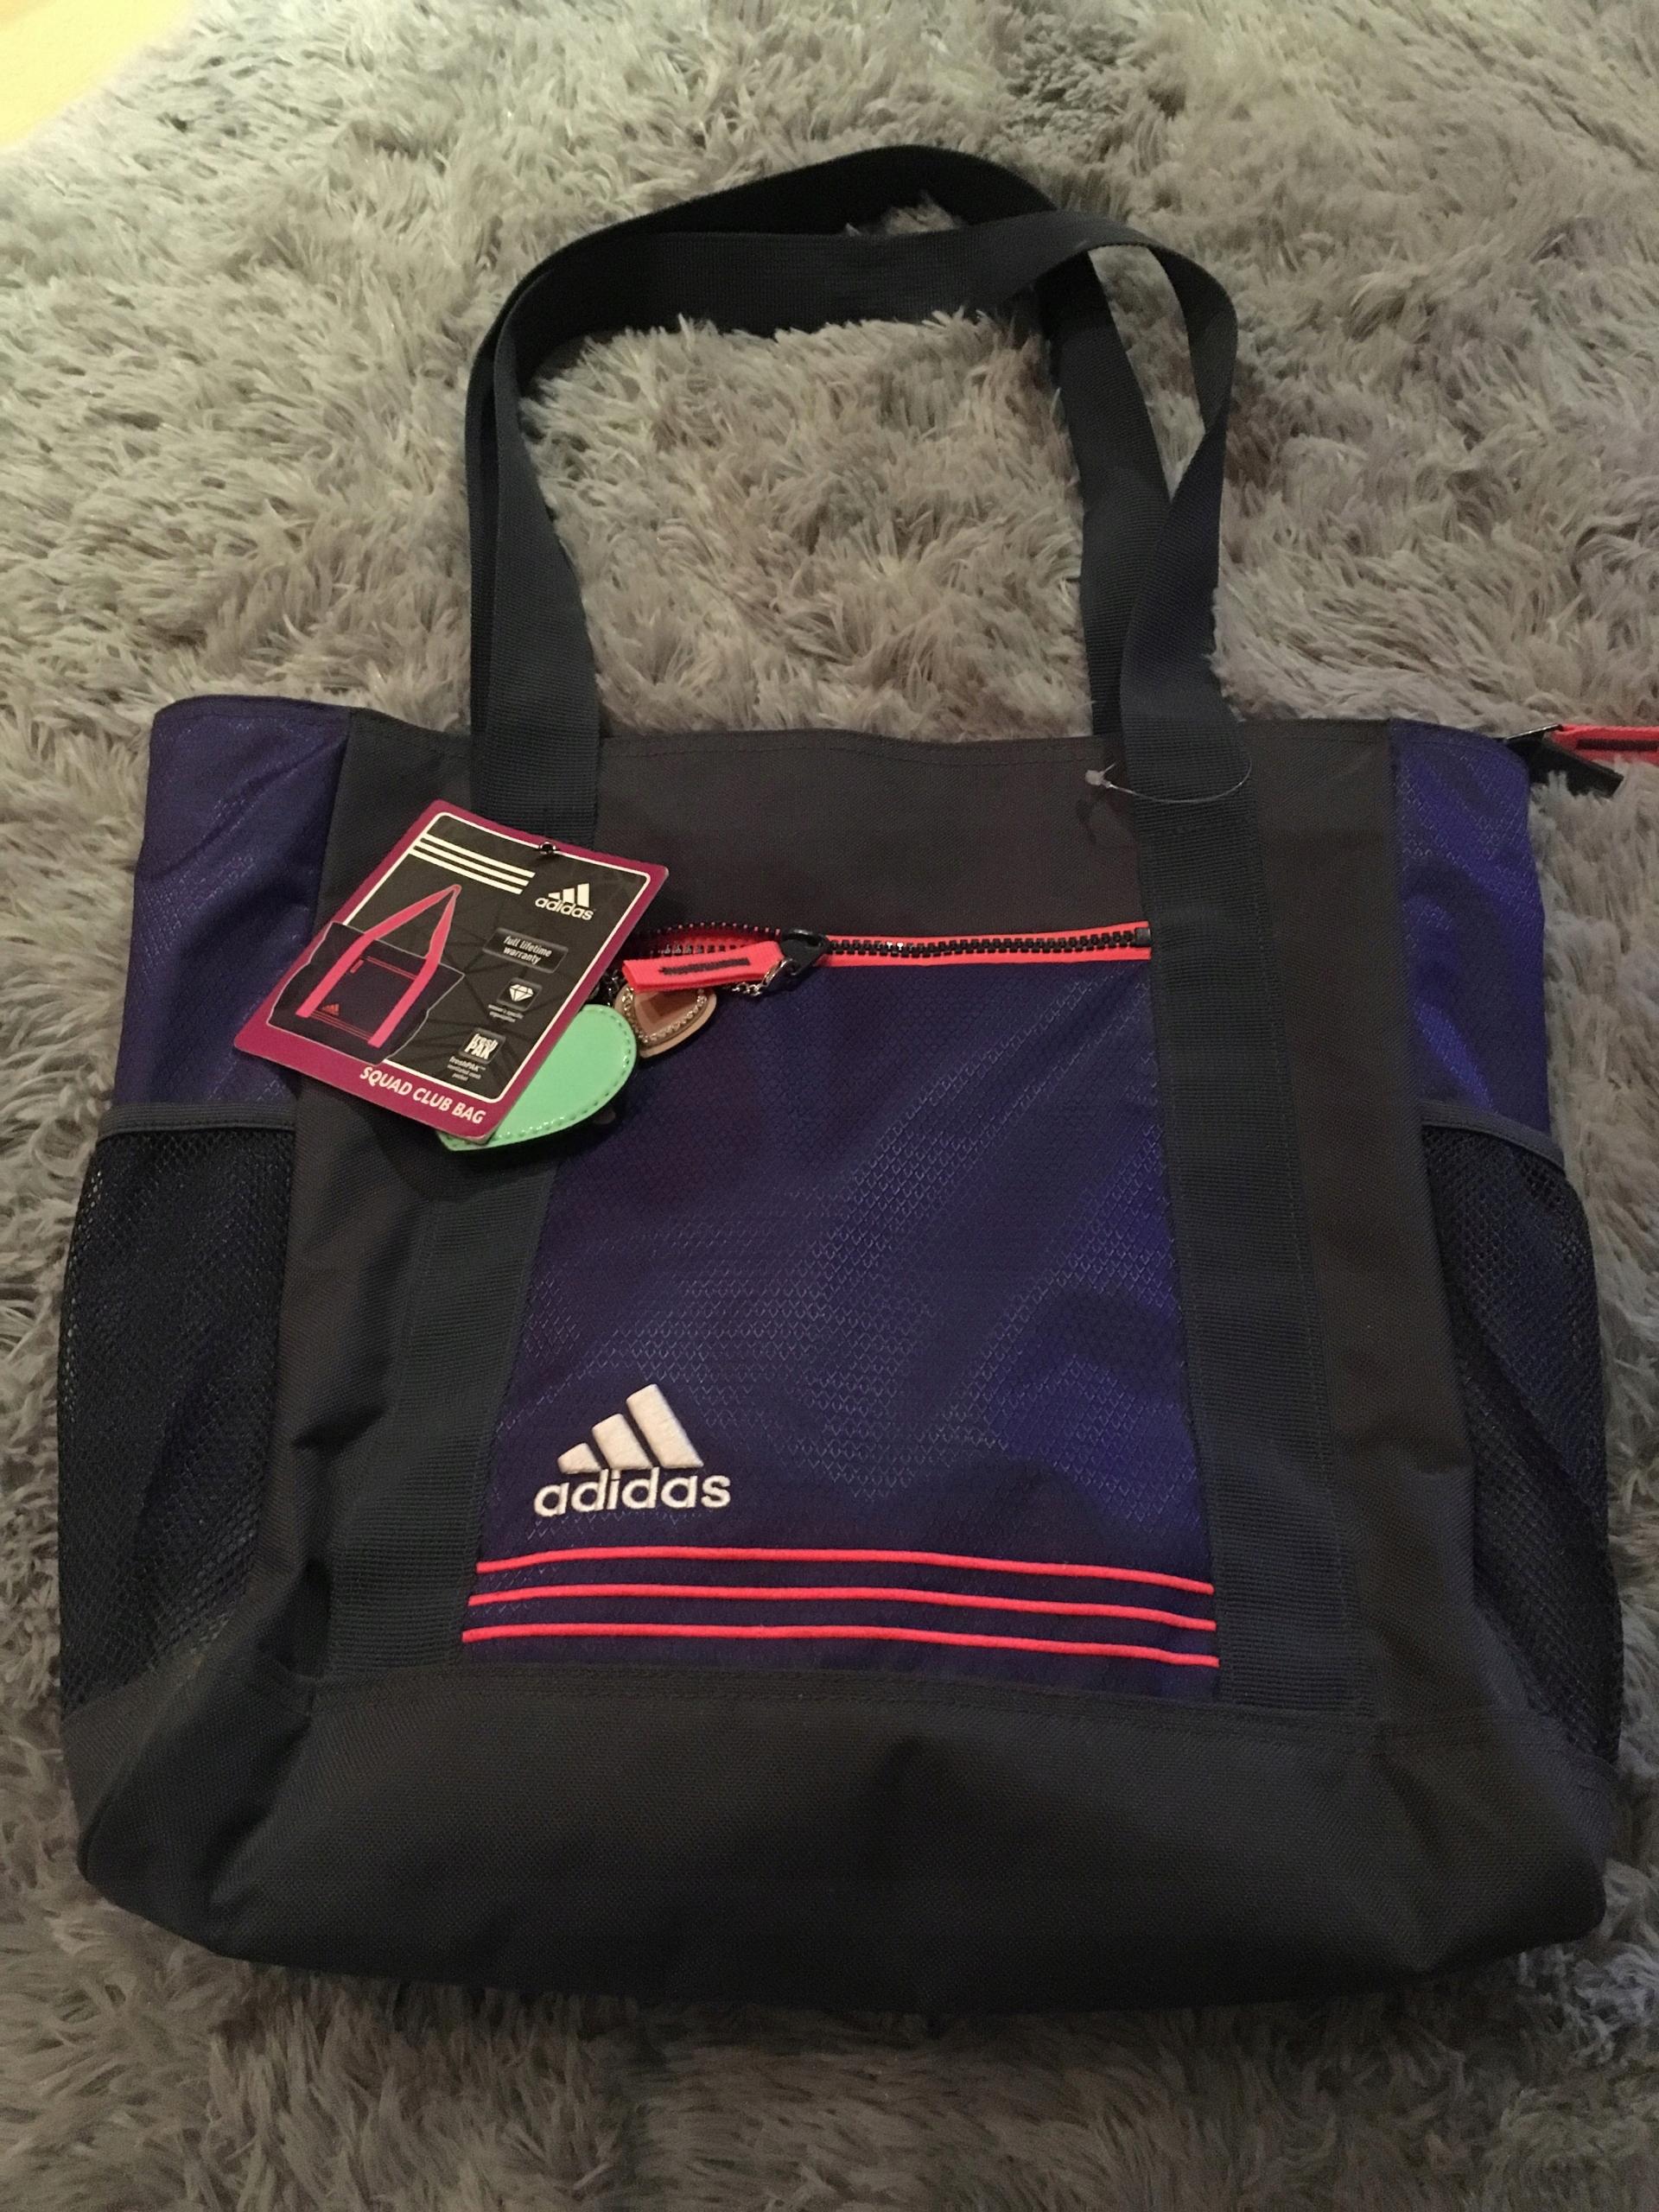 b2e4302f2142 miejska torba adidas squad club bag - 7541768765 - oficjalne ...